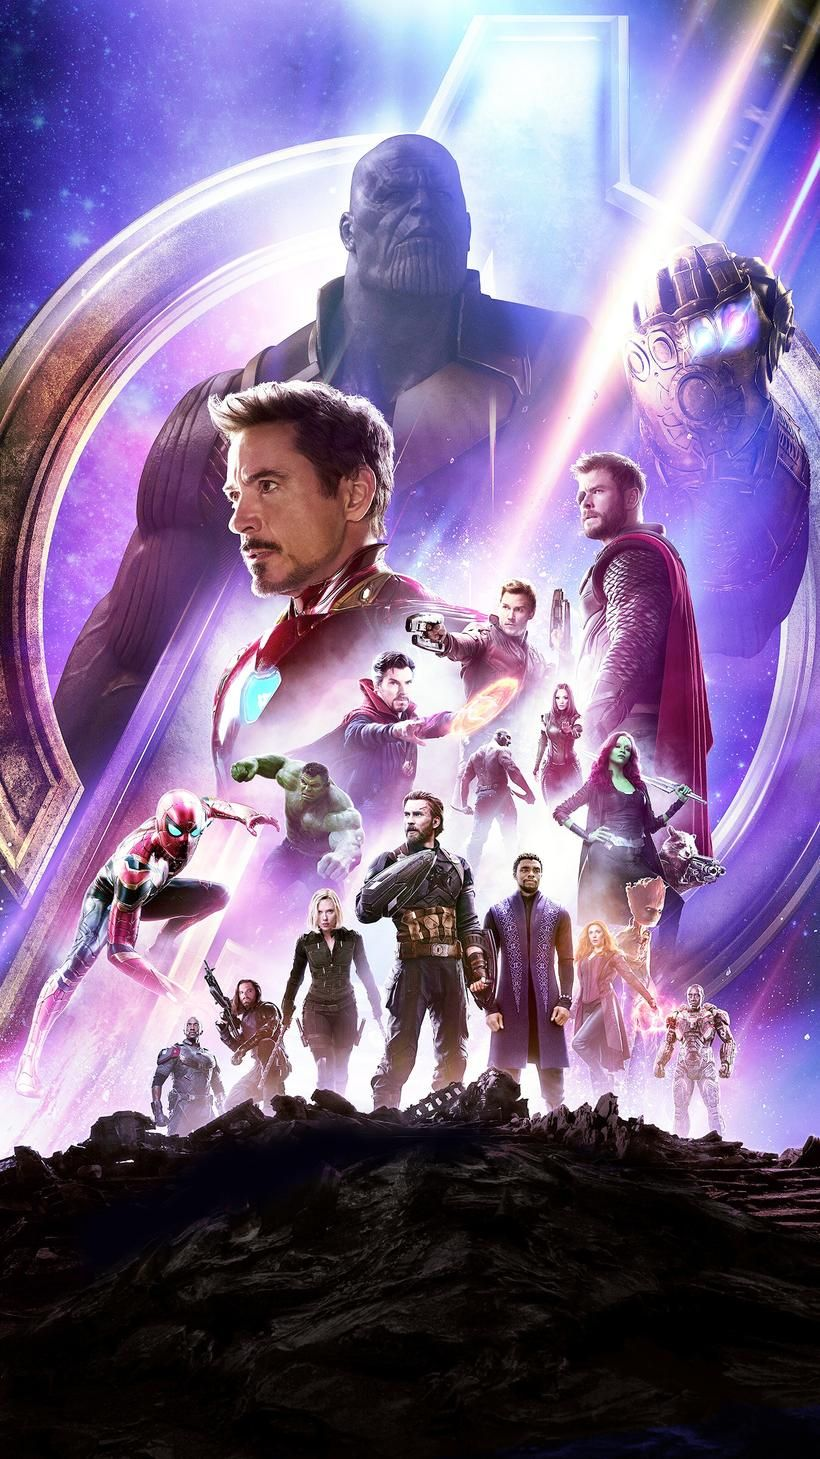 Avengers Infinity War 2018 Phone Wallpaper Moviemania Avengers Marvel Superheroes Marvel